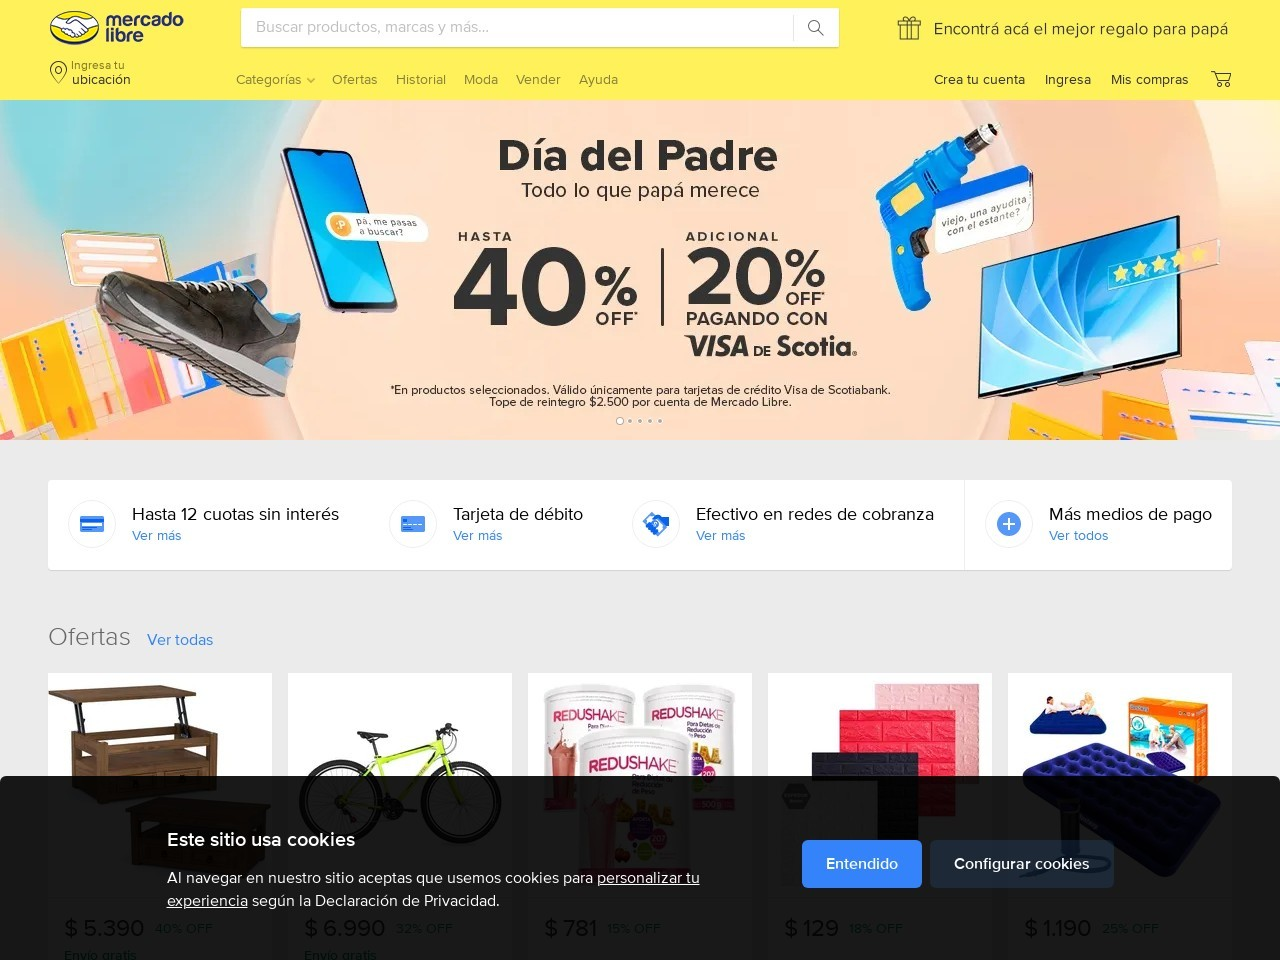 mercadolibre.com.uy